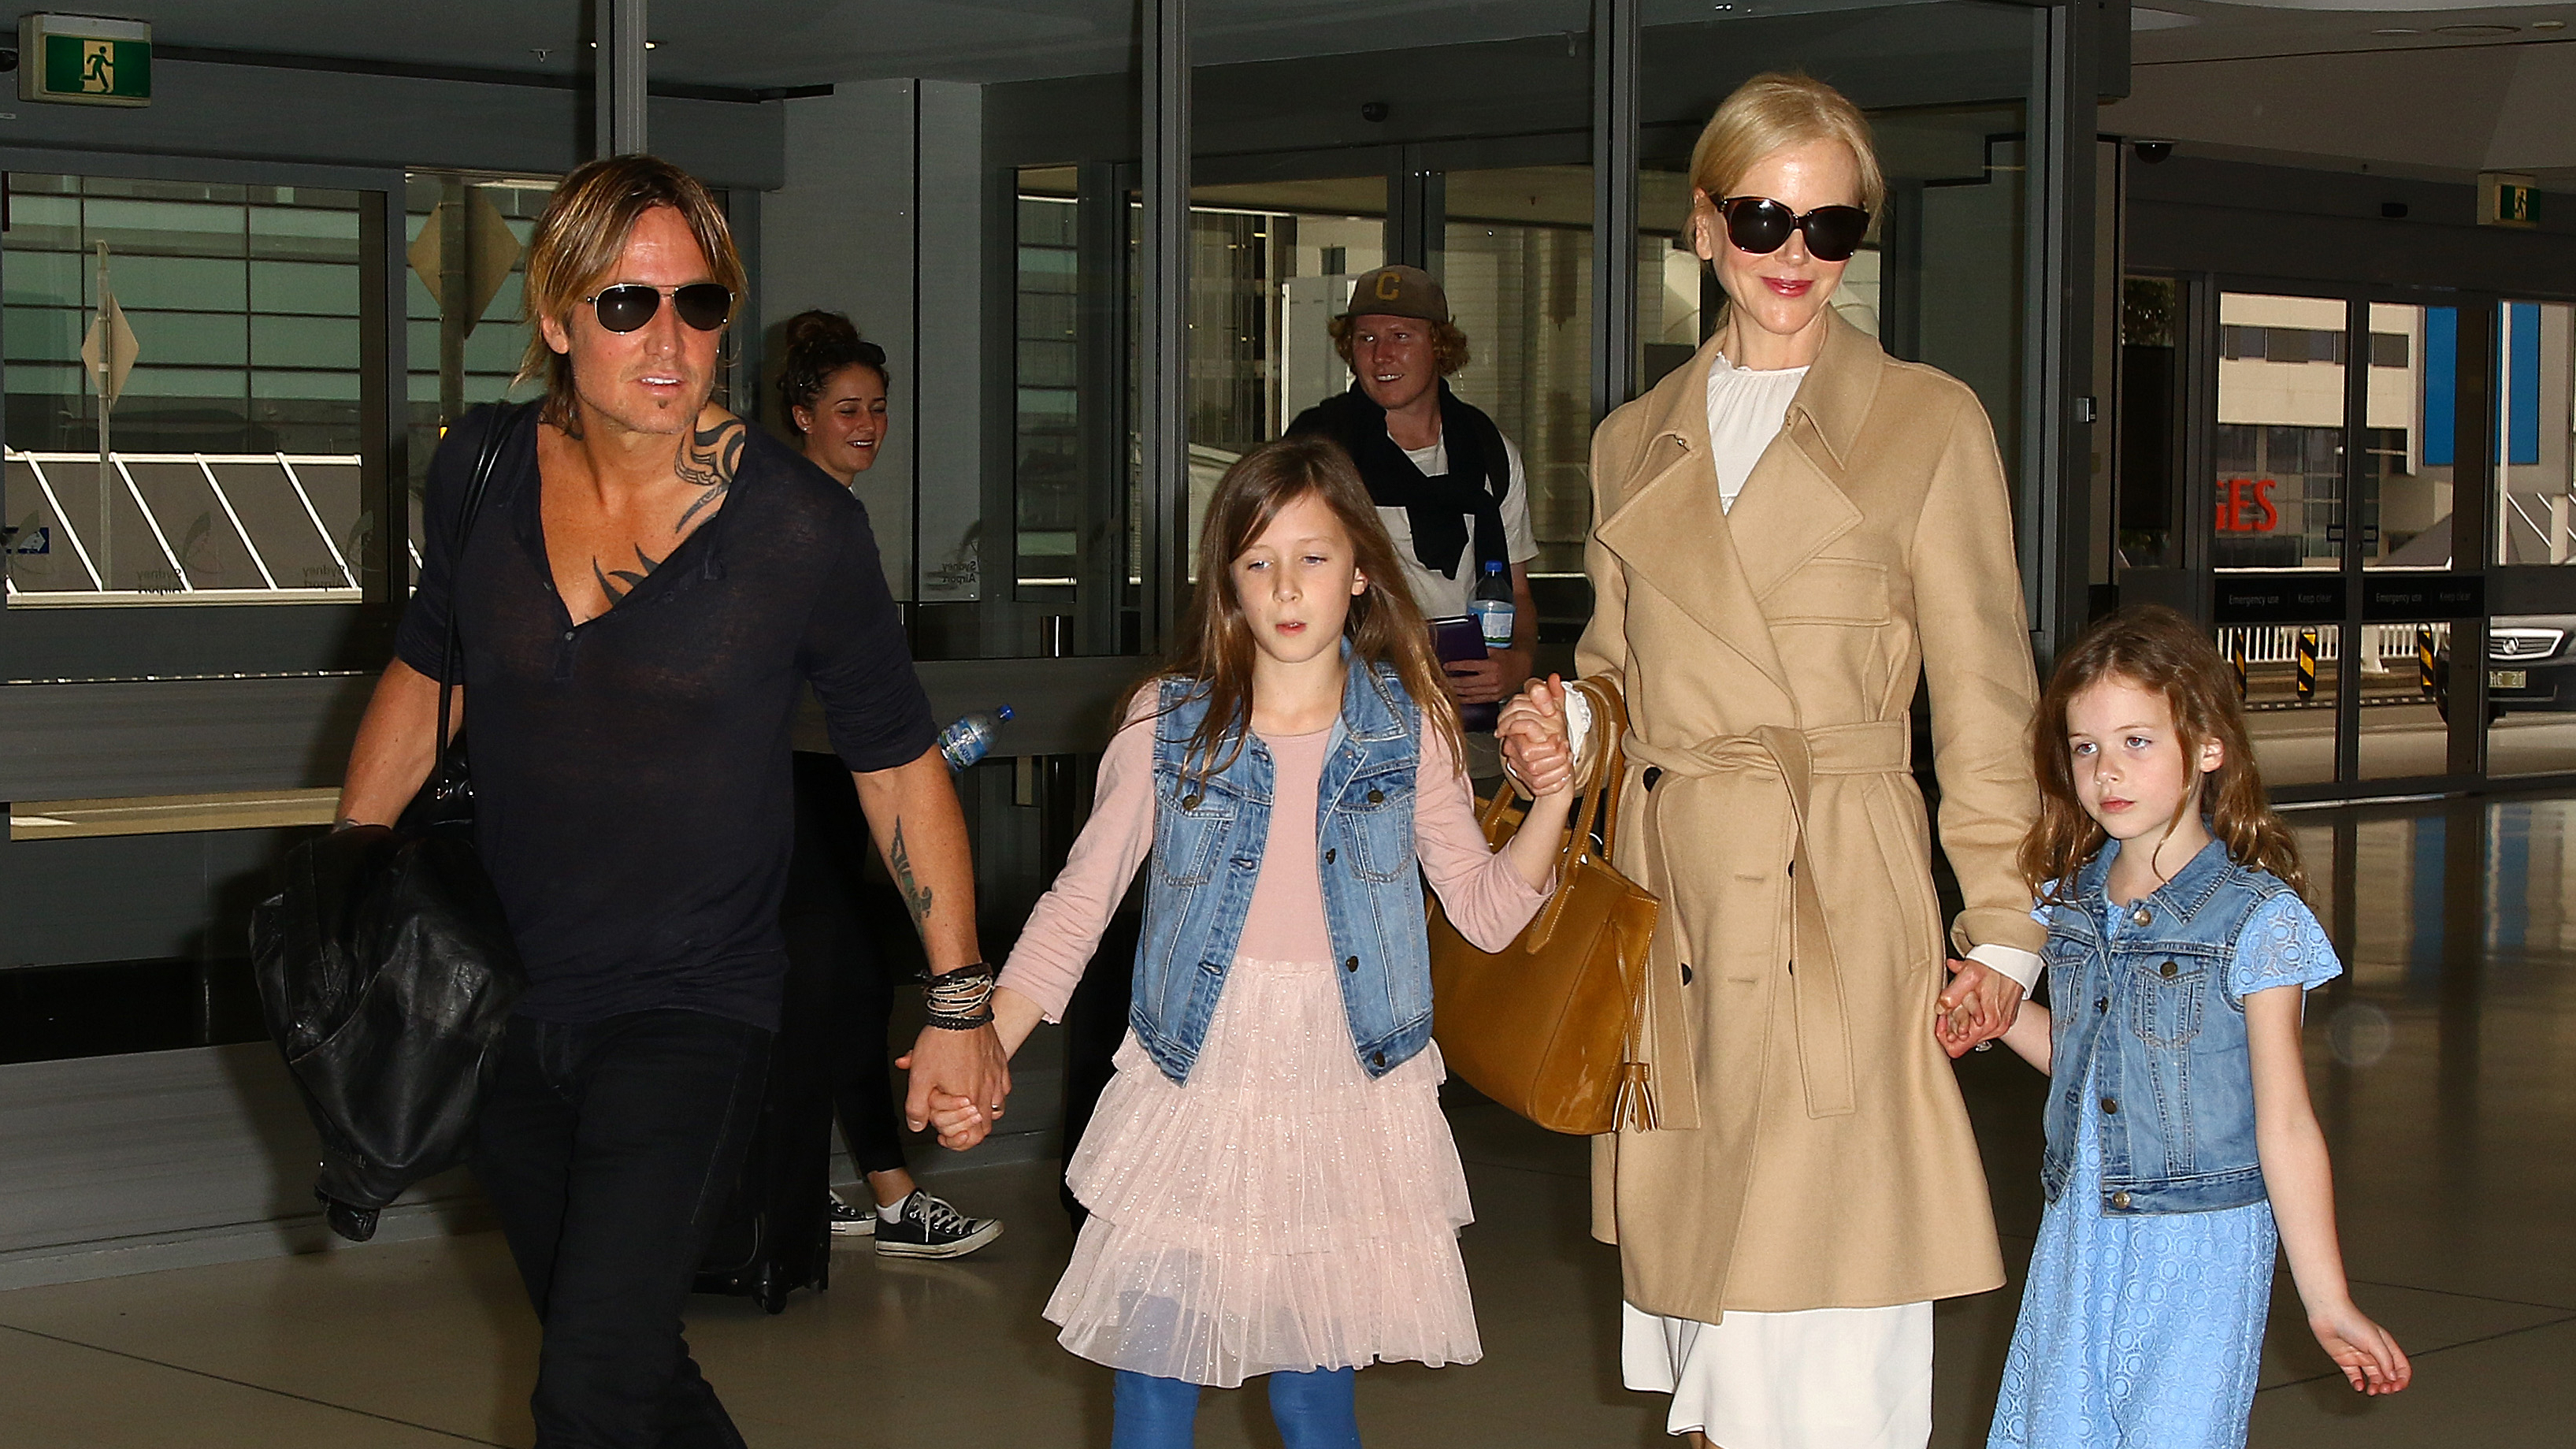 Nicole Kidman From Keith Urban: Simon Cowell, Meghan, Duchess